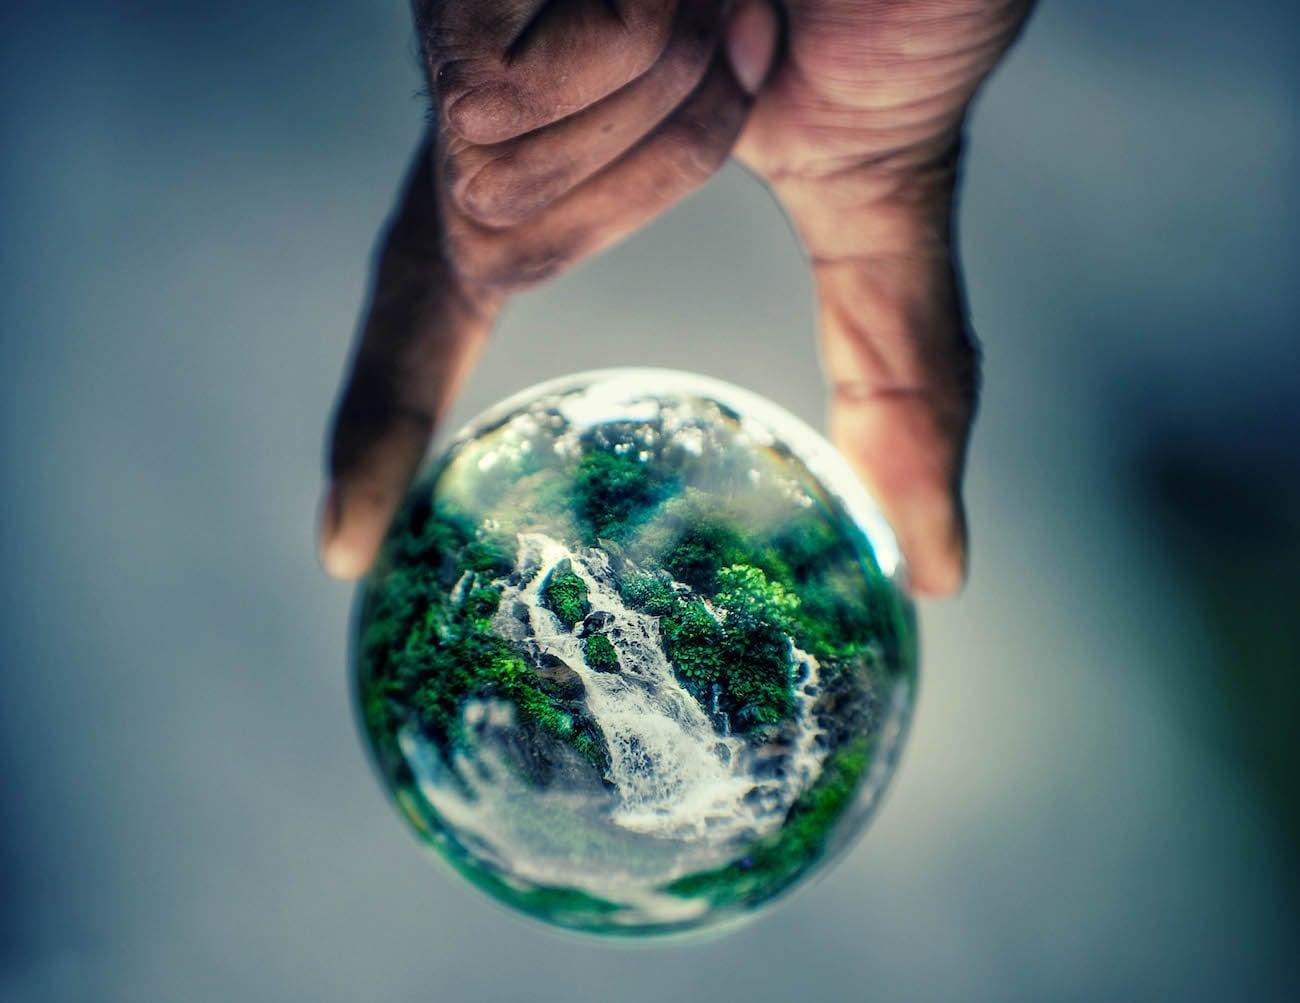 Lensball Spherical Crystal Lens Gadget Flow